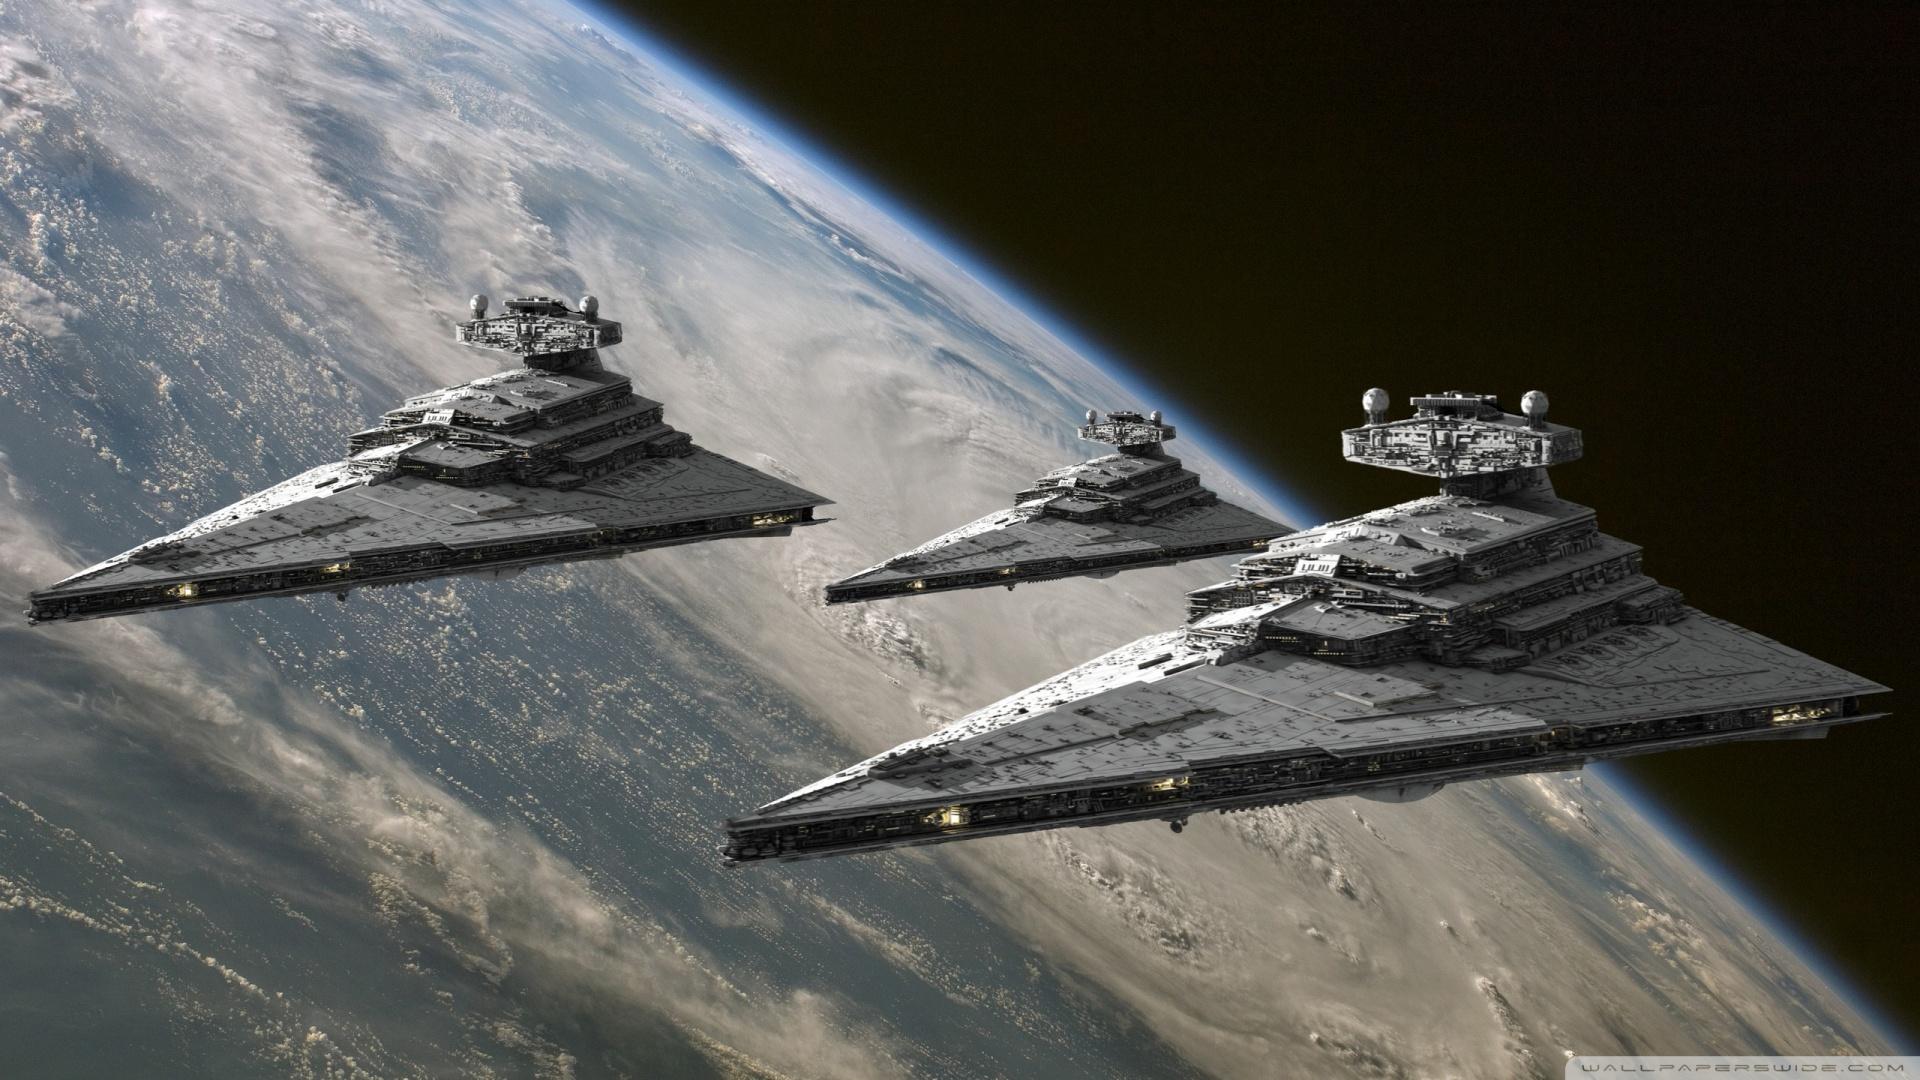 50 Star Wars Ships Wallpaper On Wallpapersafari